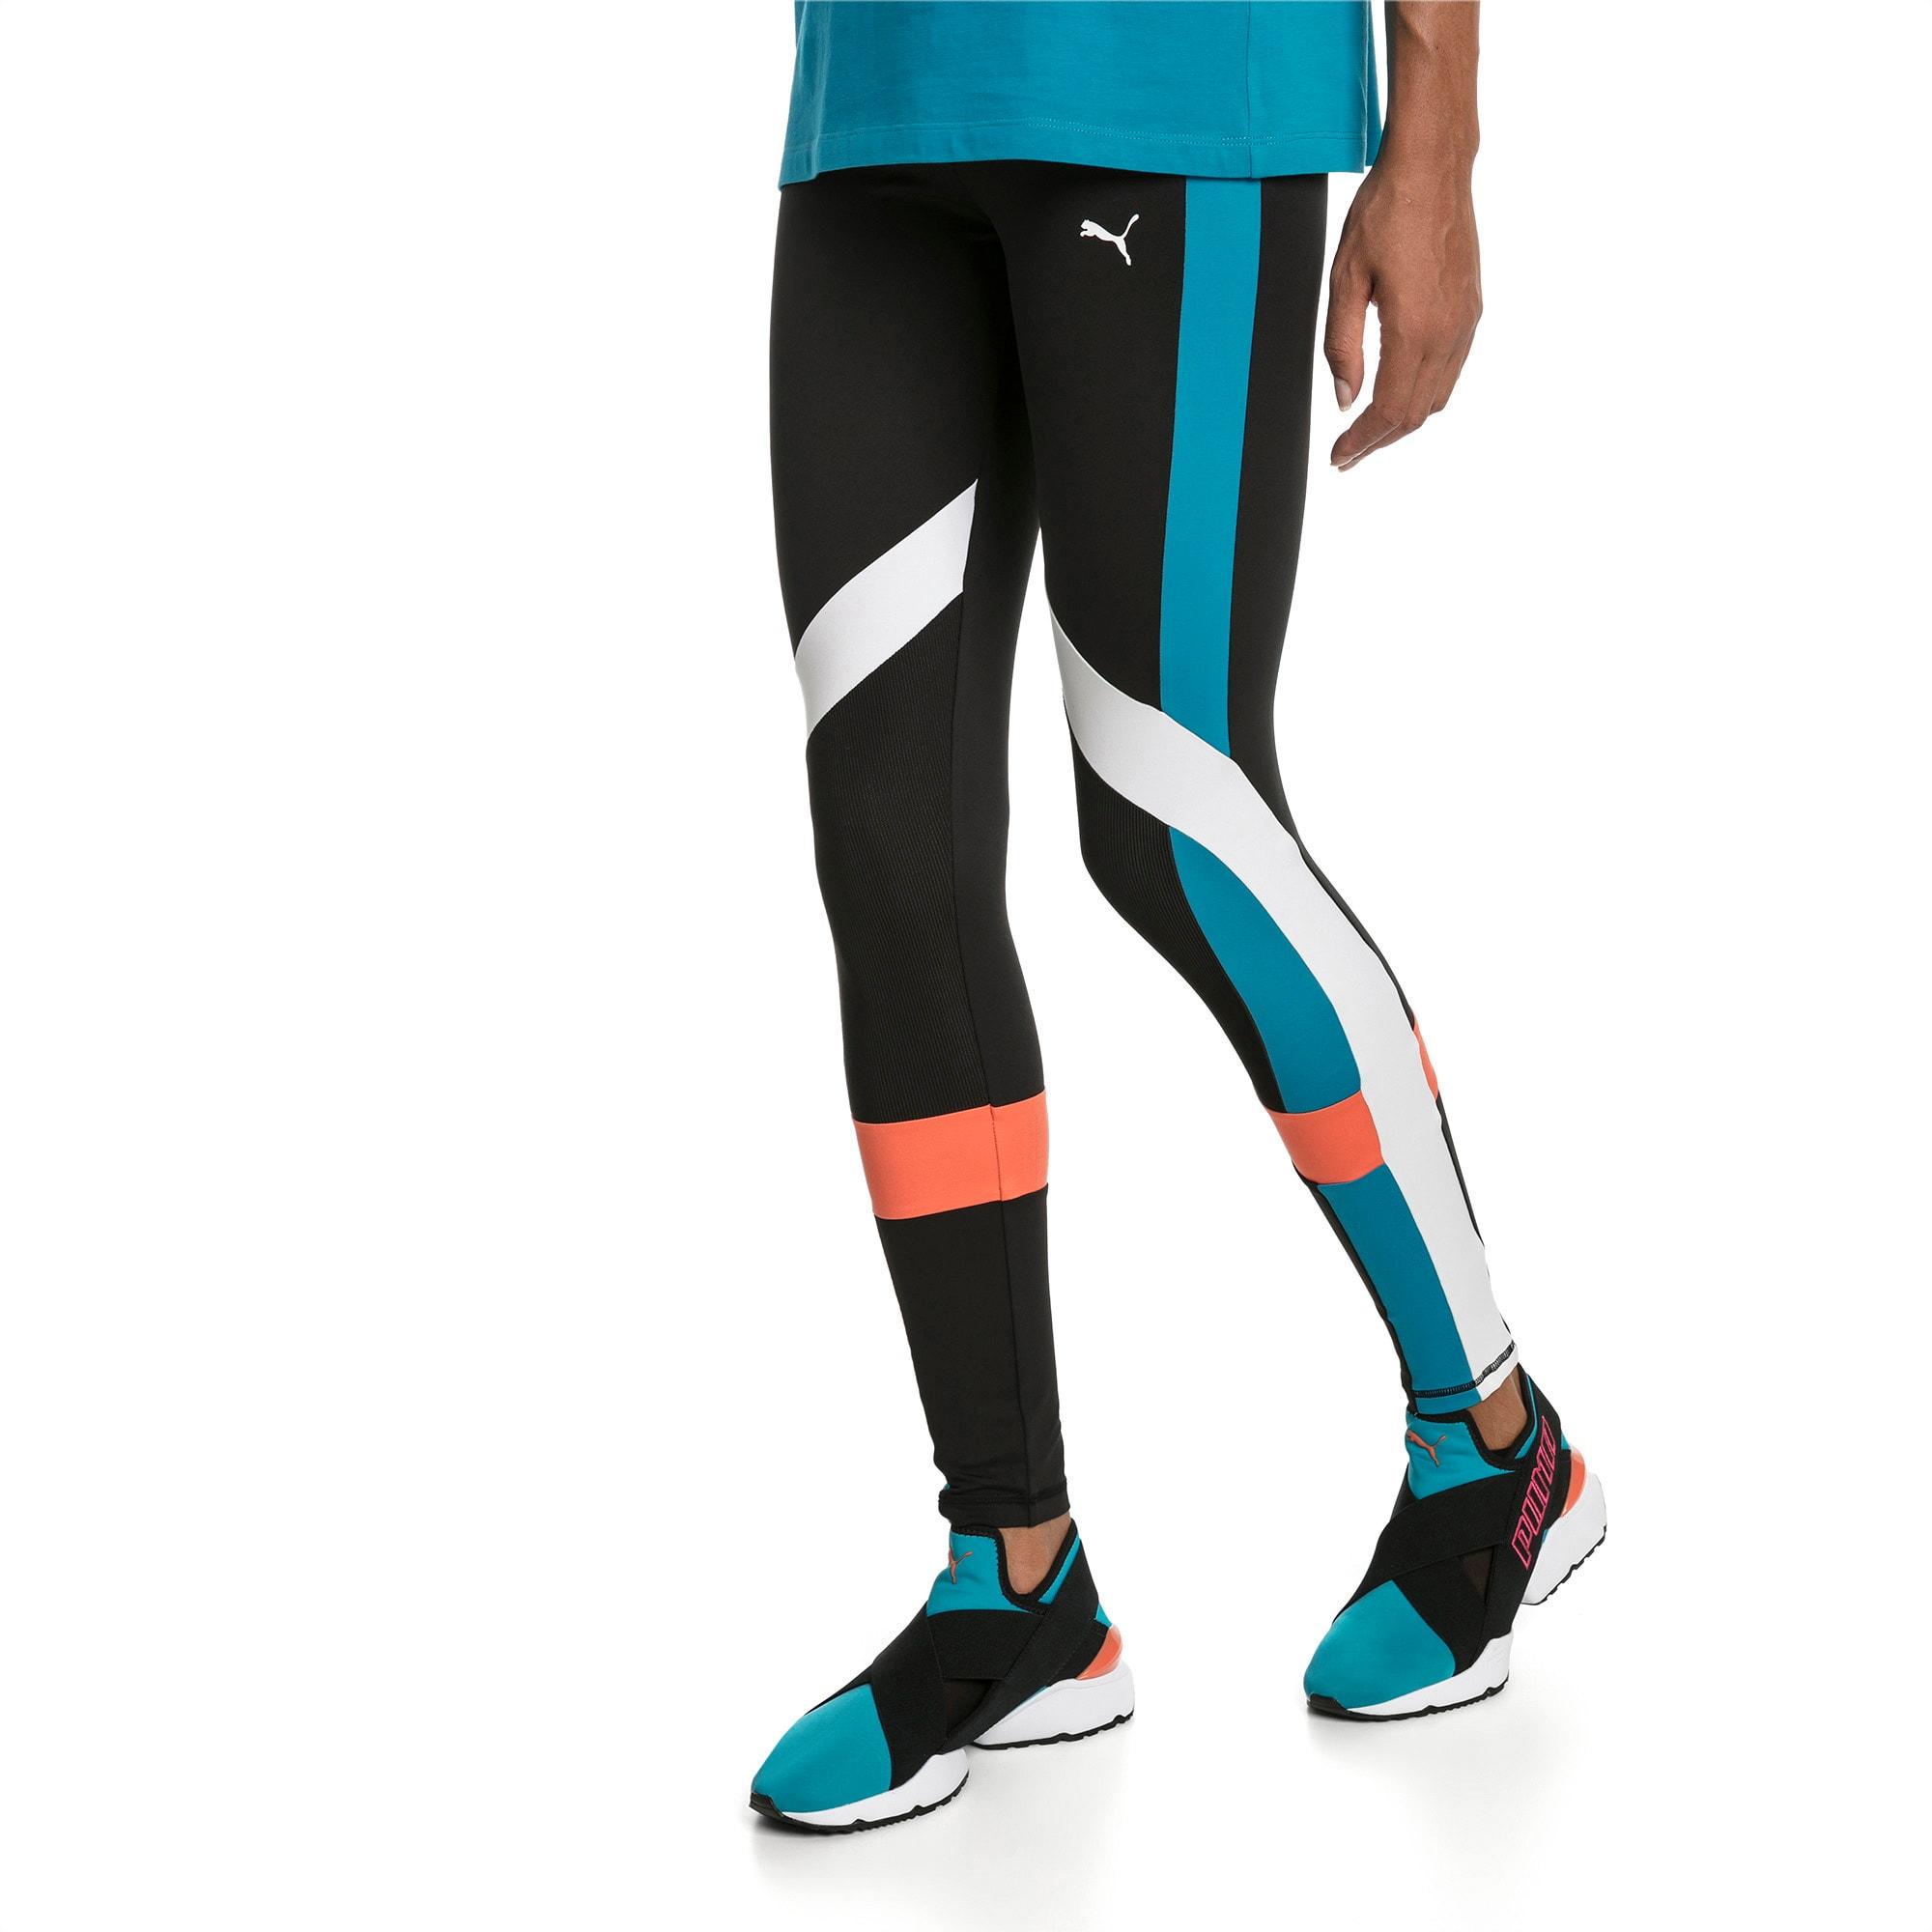 buscar original como escoger mejores marcas Chase Women's Leggings | PUMA Tights | PUMA